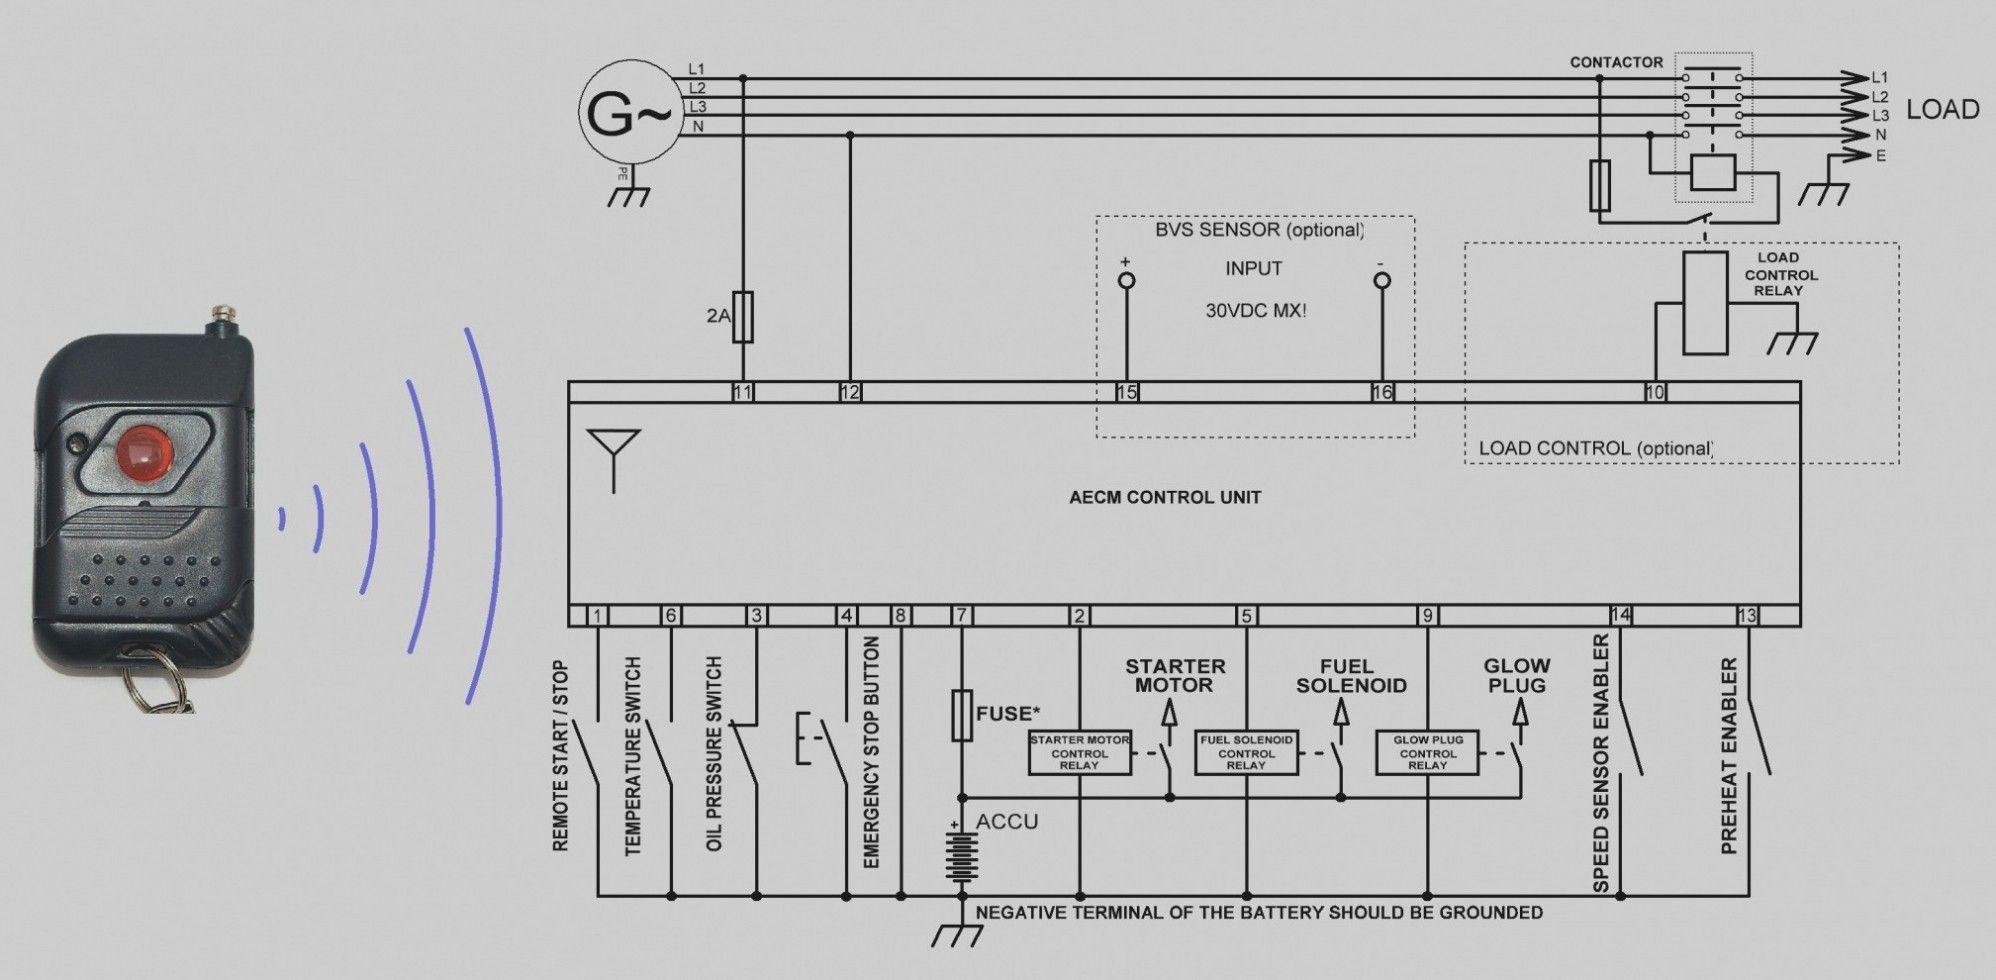 unique electric fan motor wiring diagram pdf diagram diagramsample diagramtemplate wiringdiagram diagramchart worksheet worksheettemplate [ 1996 x 980 Pixel ]